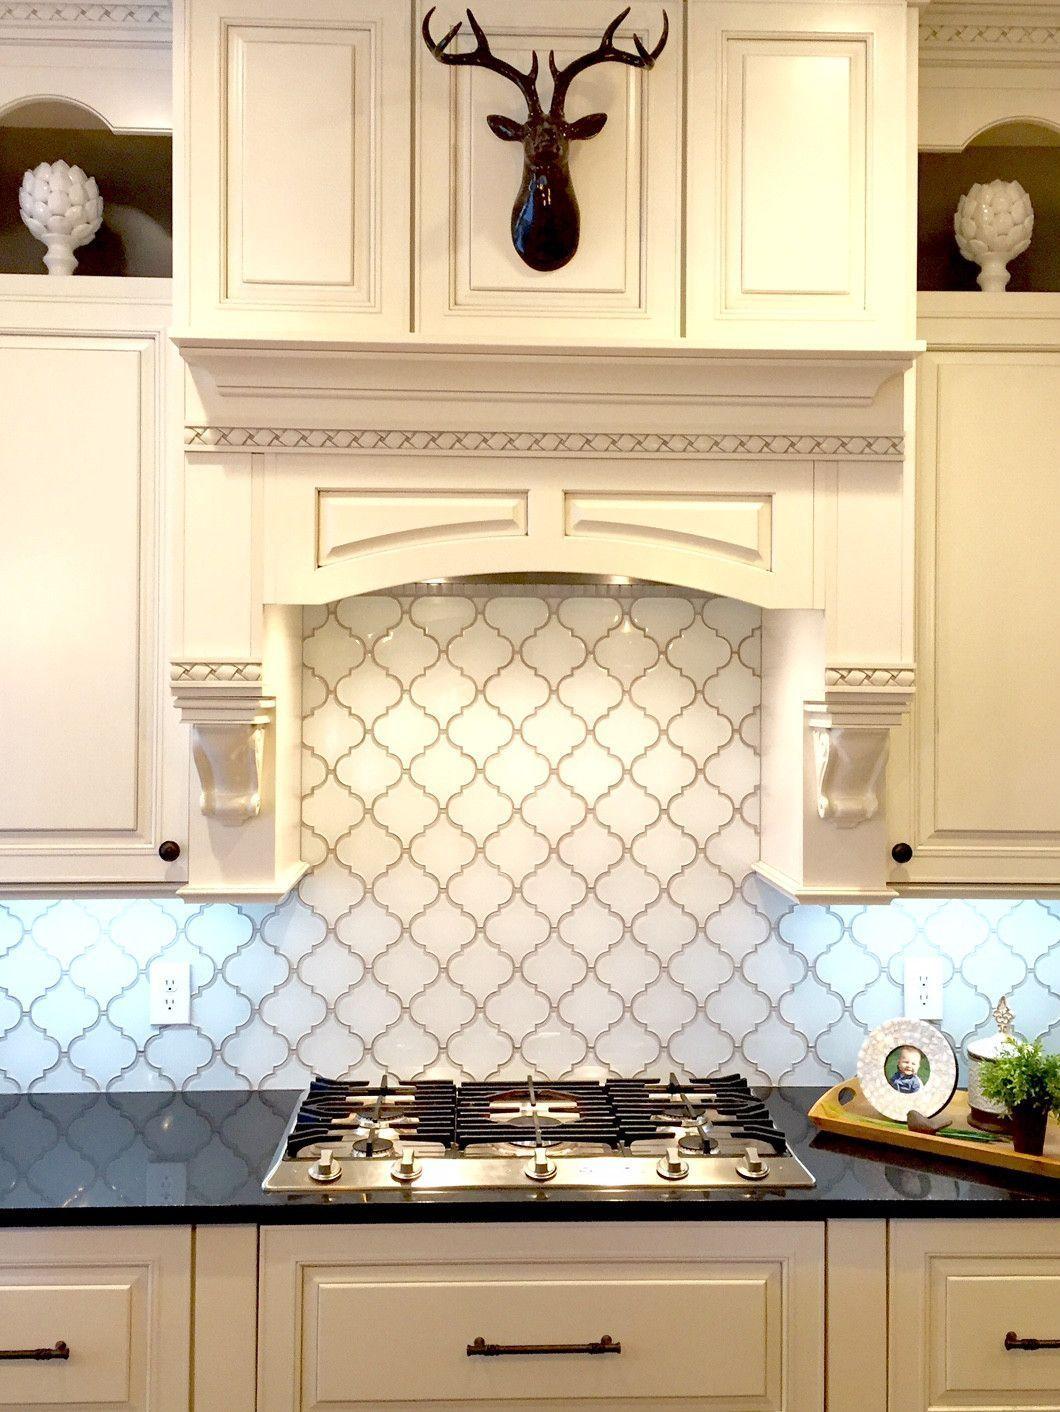 - Snow White Arabesque Glass Mosaic Tiles Rustic Kitchen Cabinets